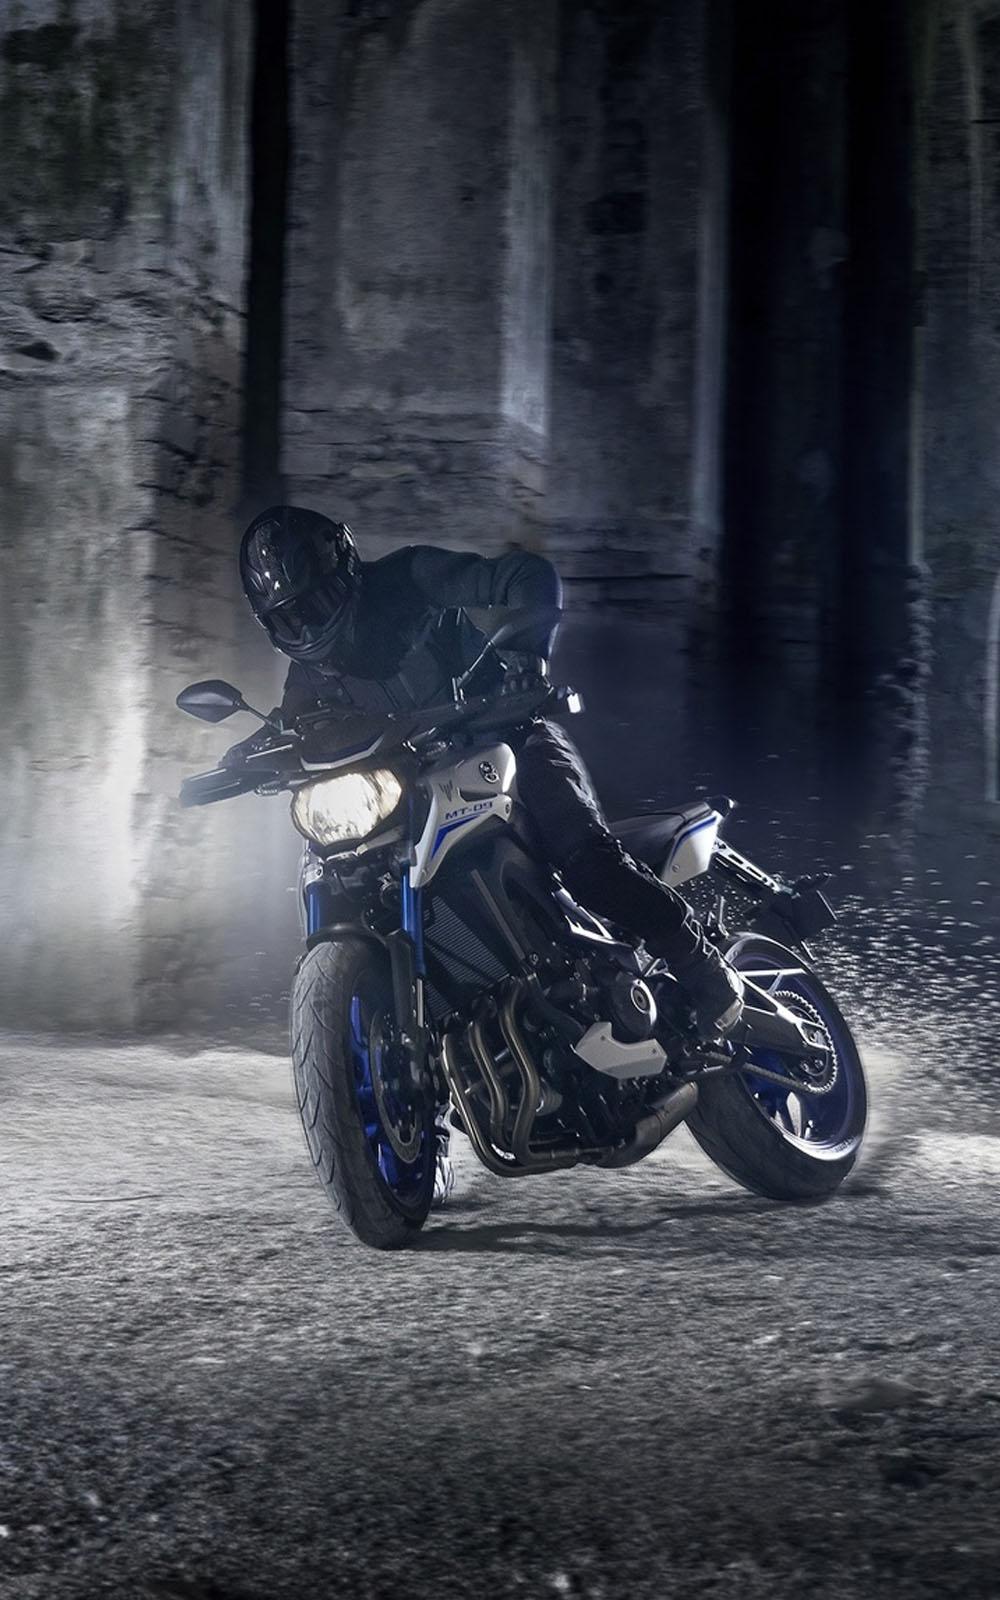 Unduh 840 Wallpaper Yamaha Foto Terbaik